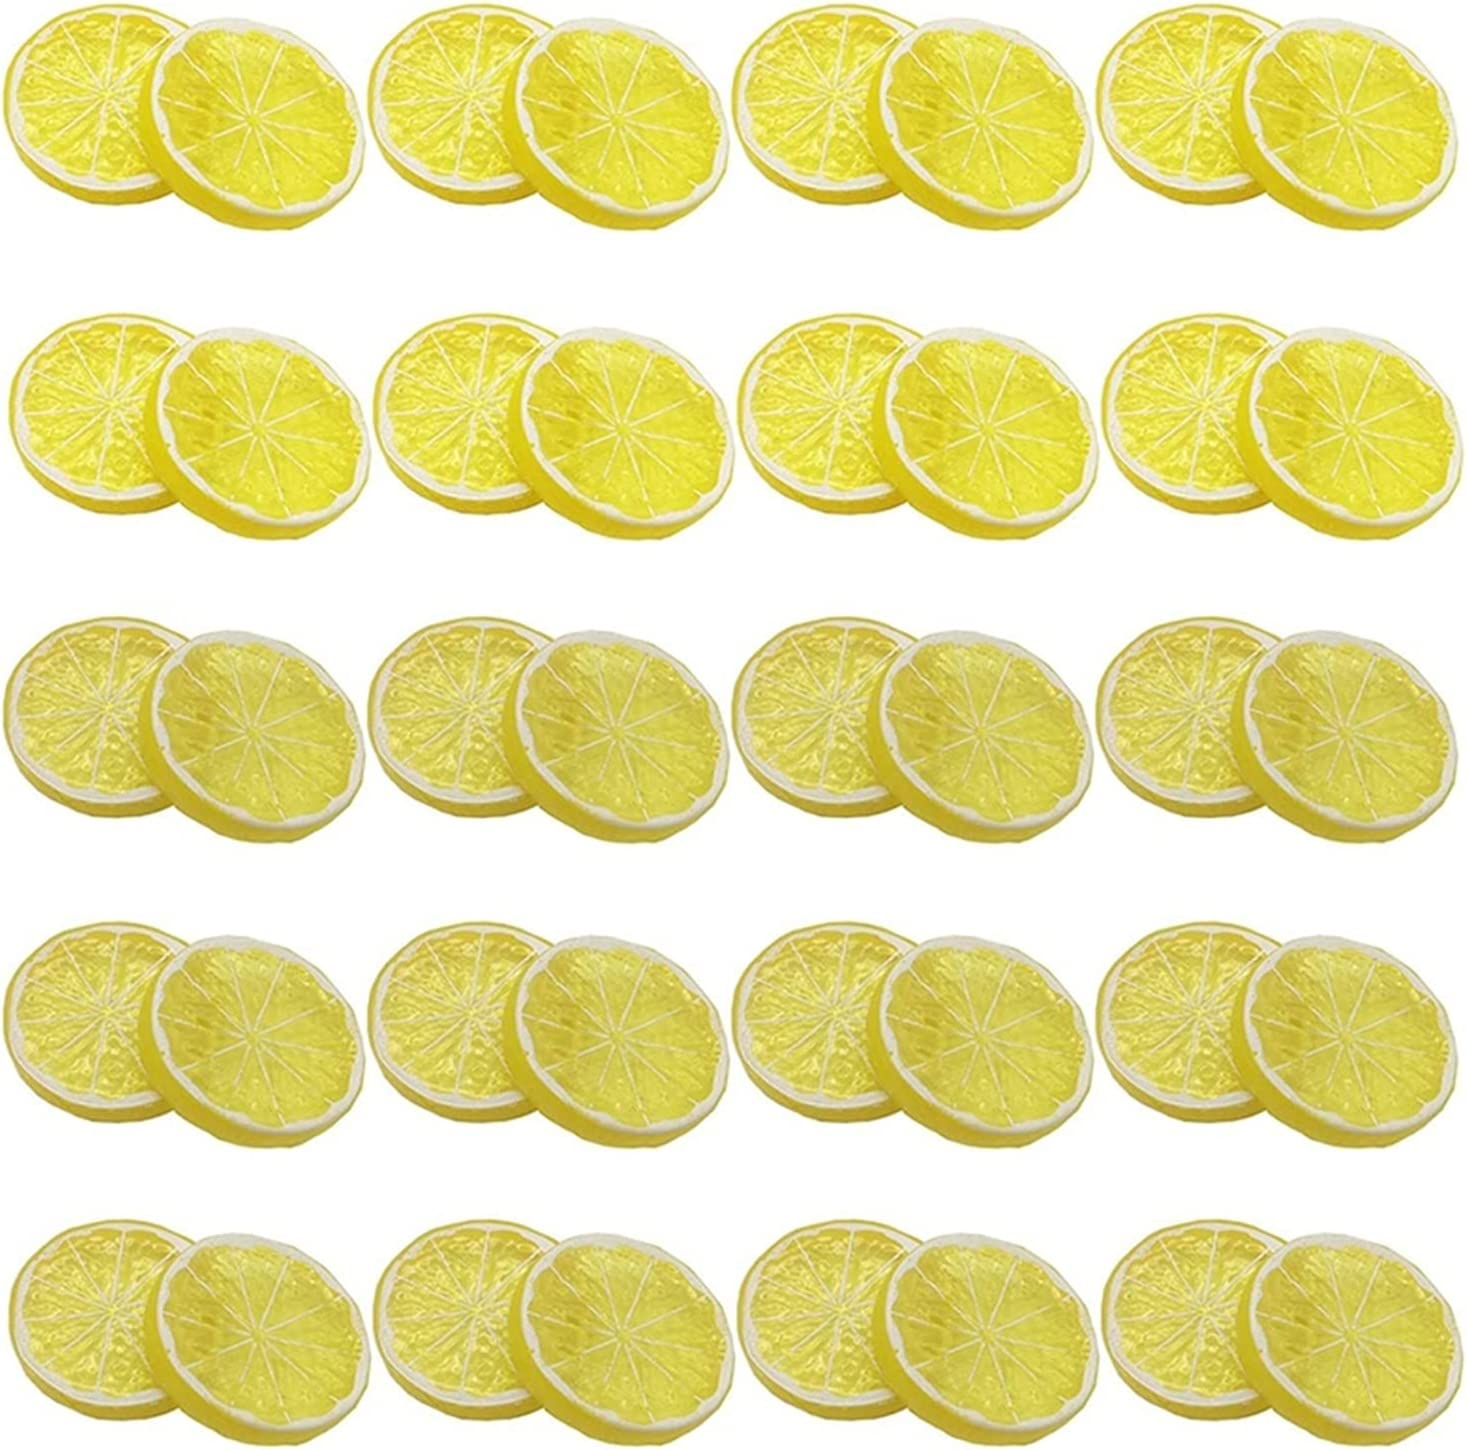 JJYGXYG Artificial Fruit Lemon It is Spasm price very popular Slice Mini Fake